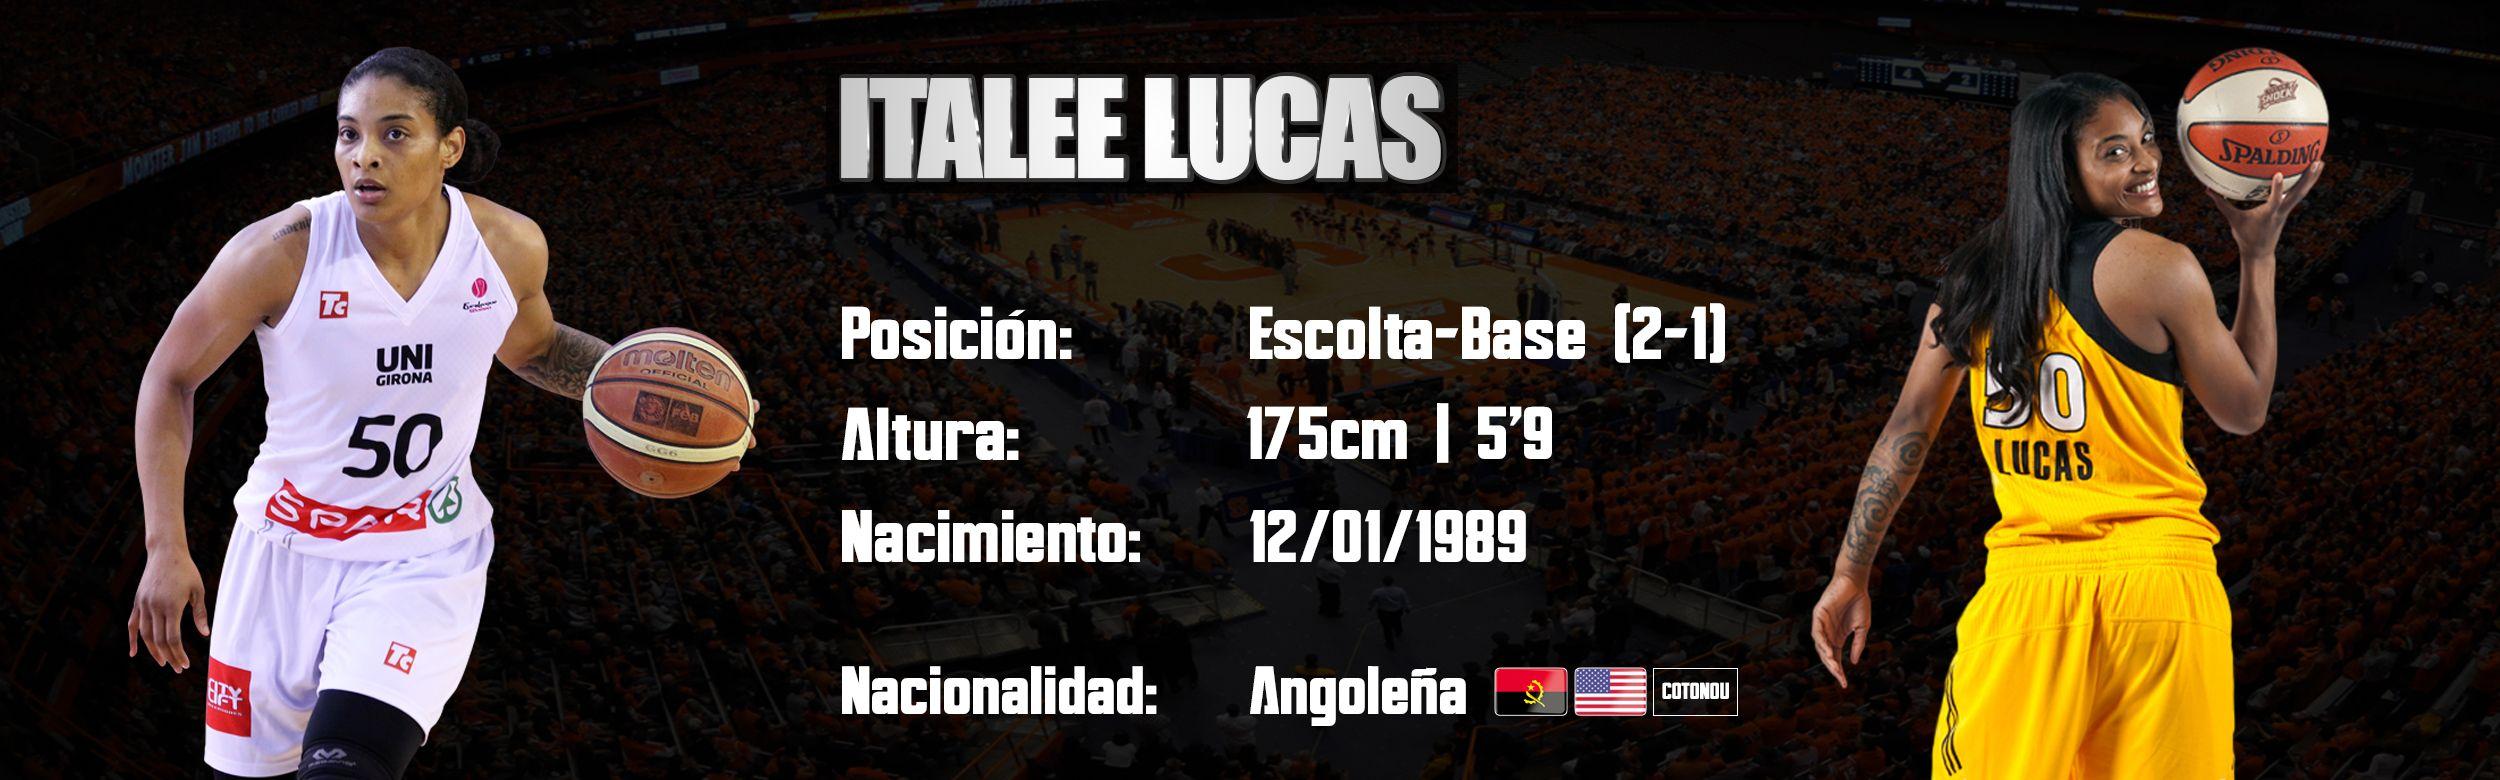 Italee Lucas